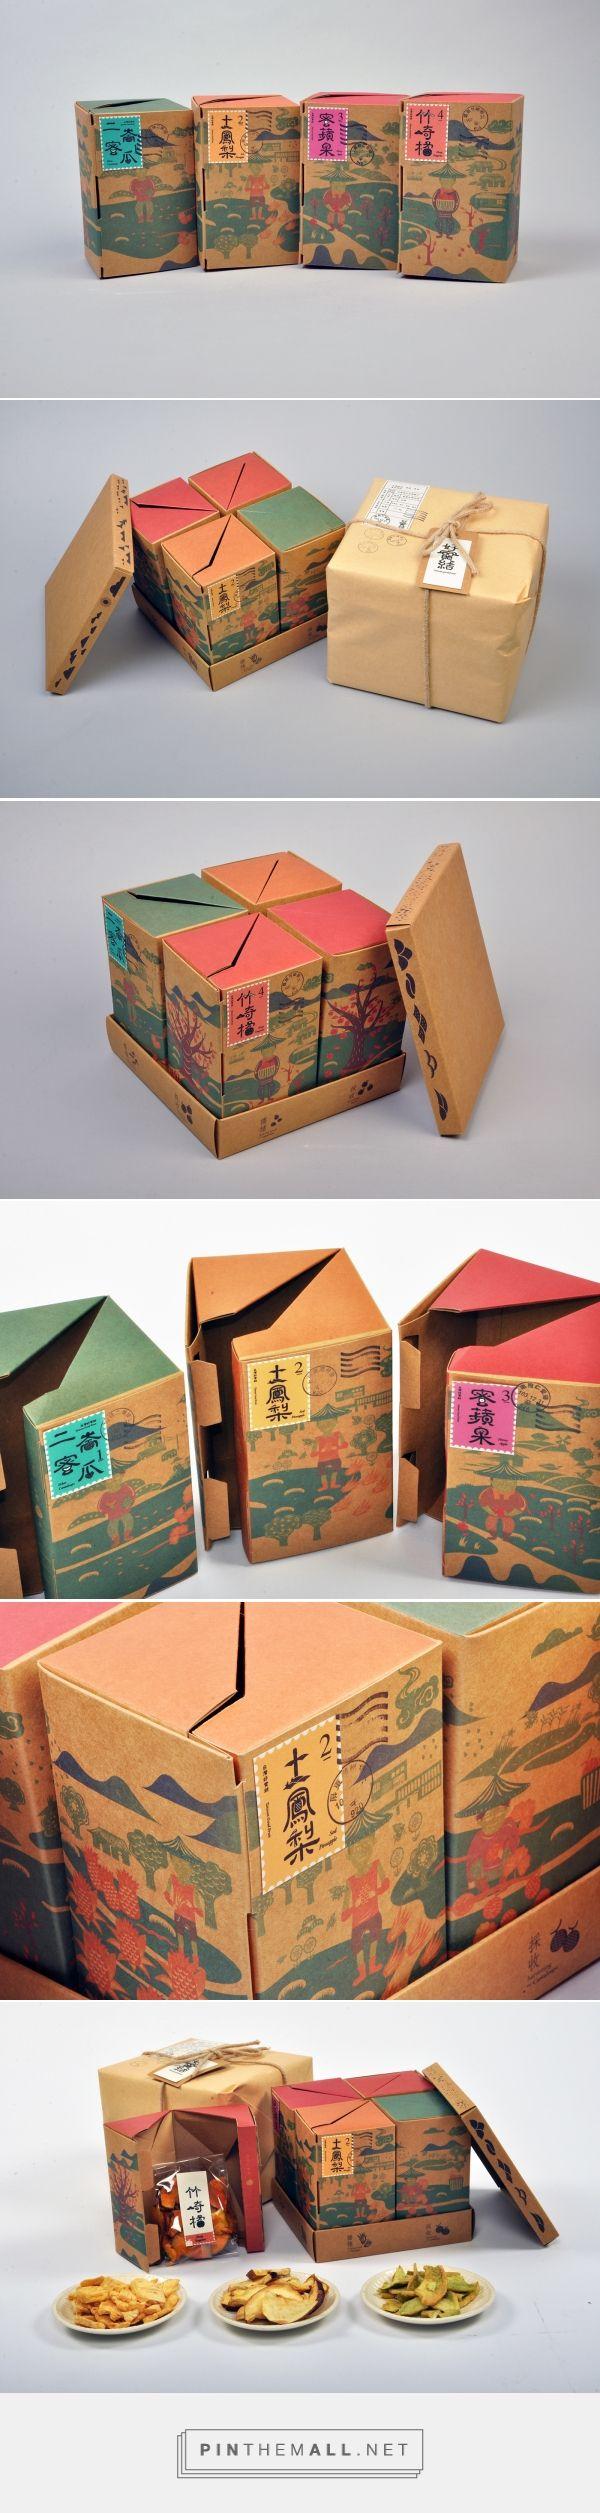 Taiwan good fruit on Behance - created via https://pinthemall.net